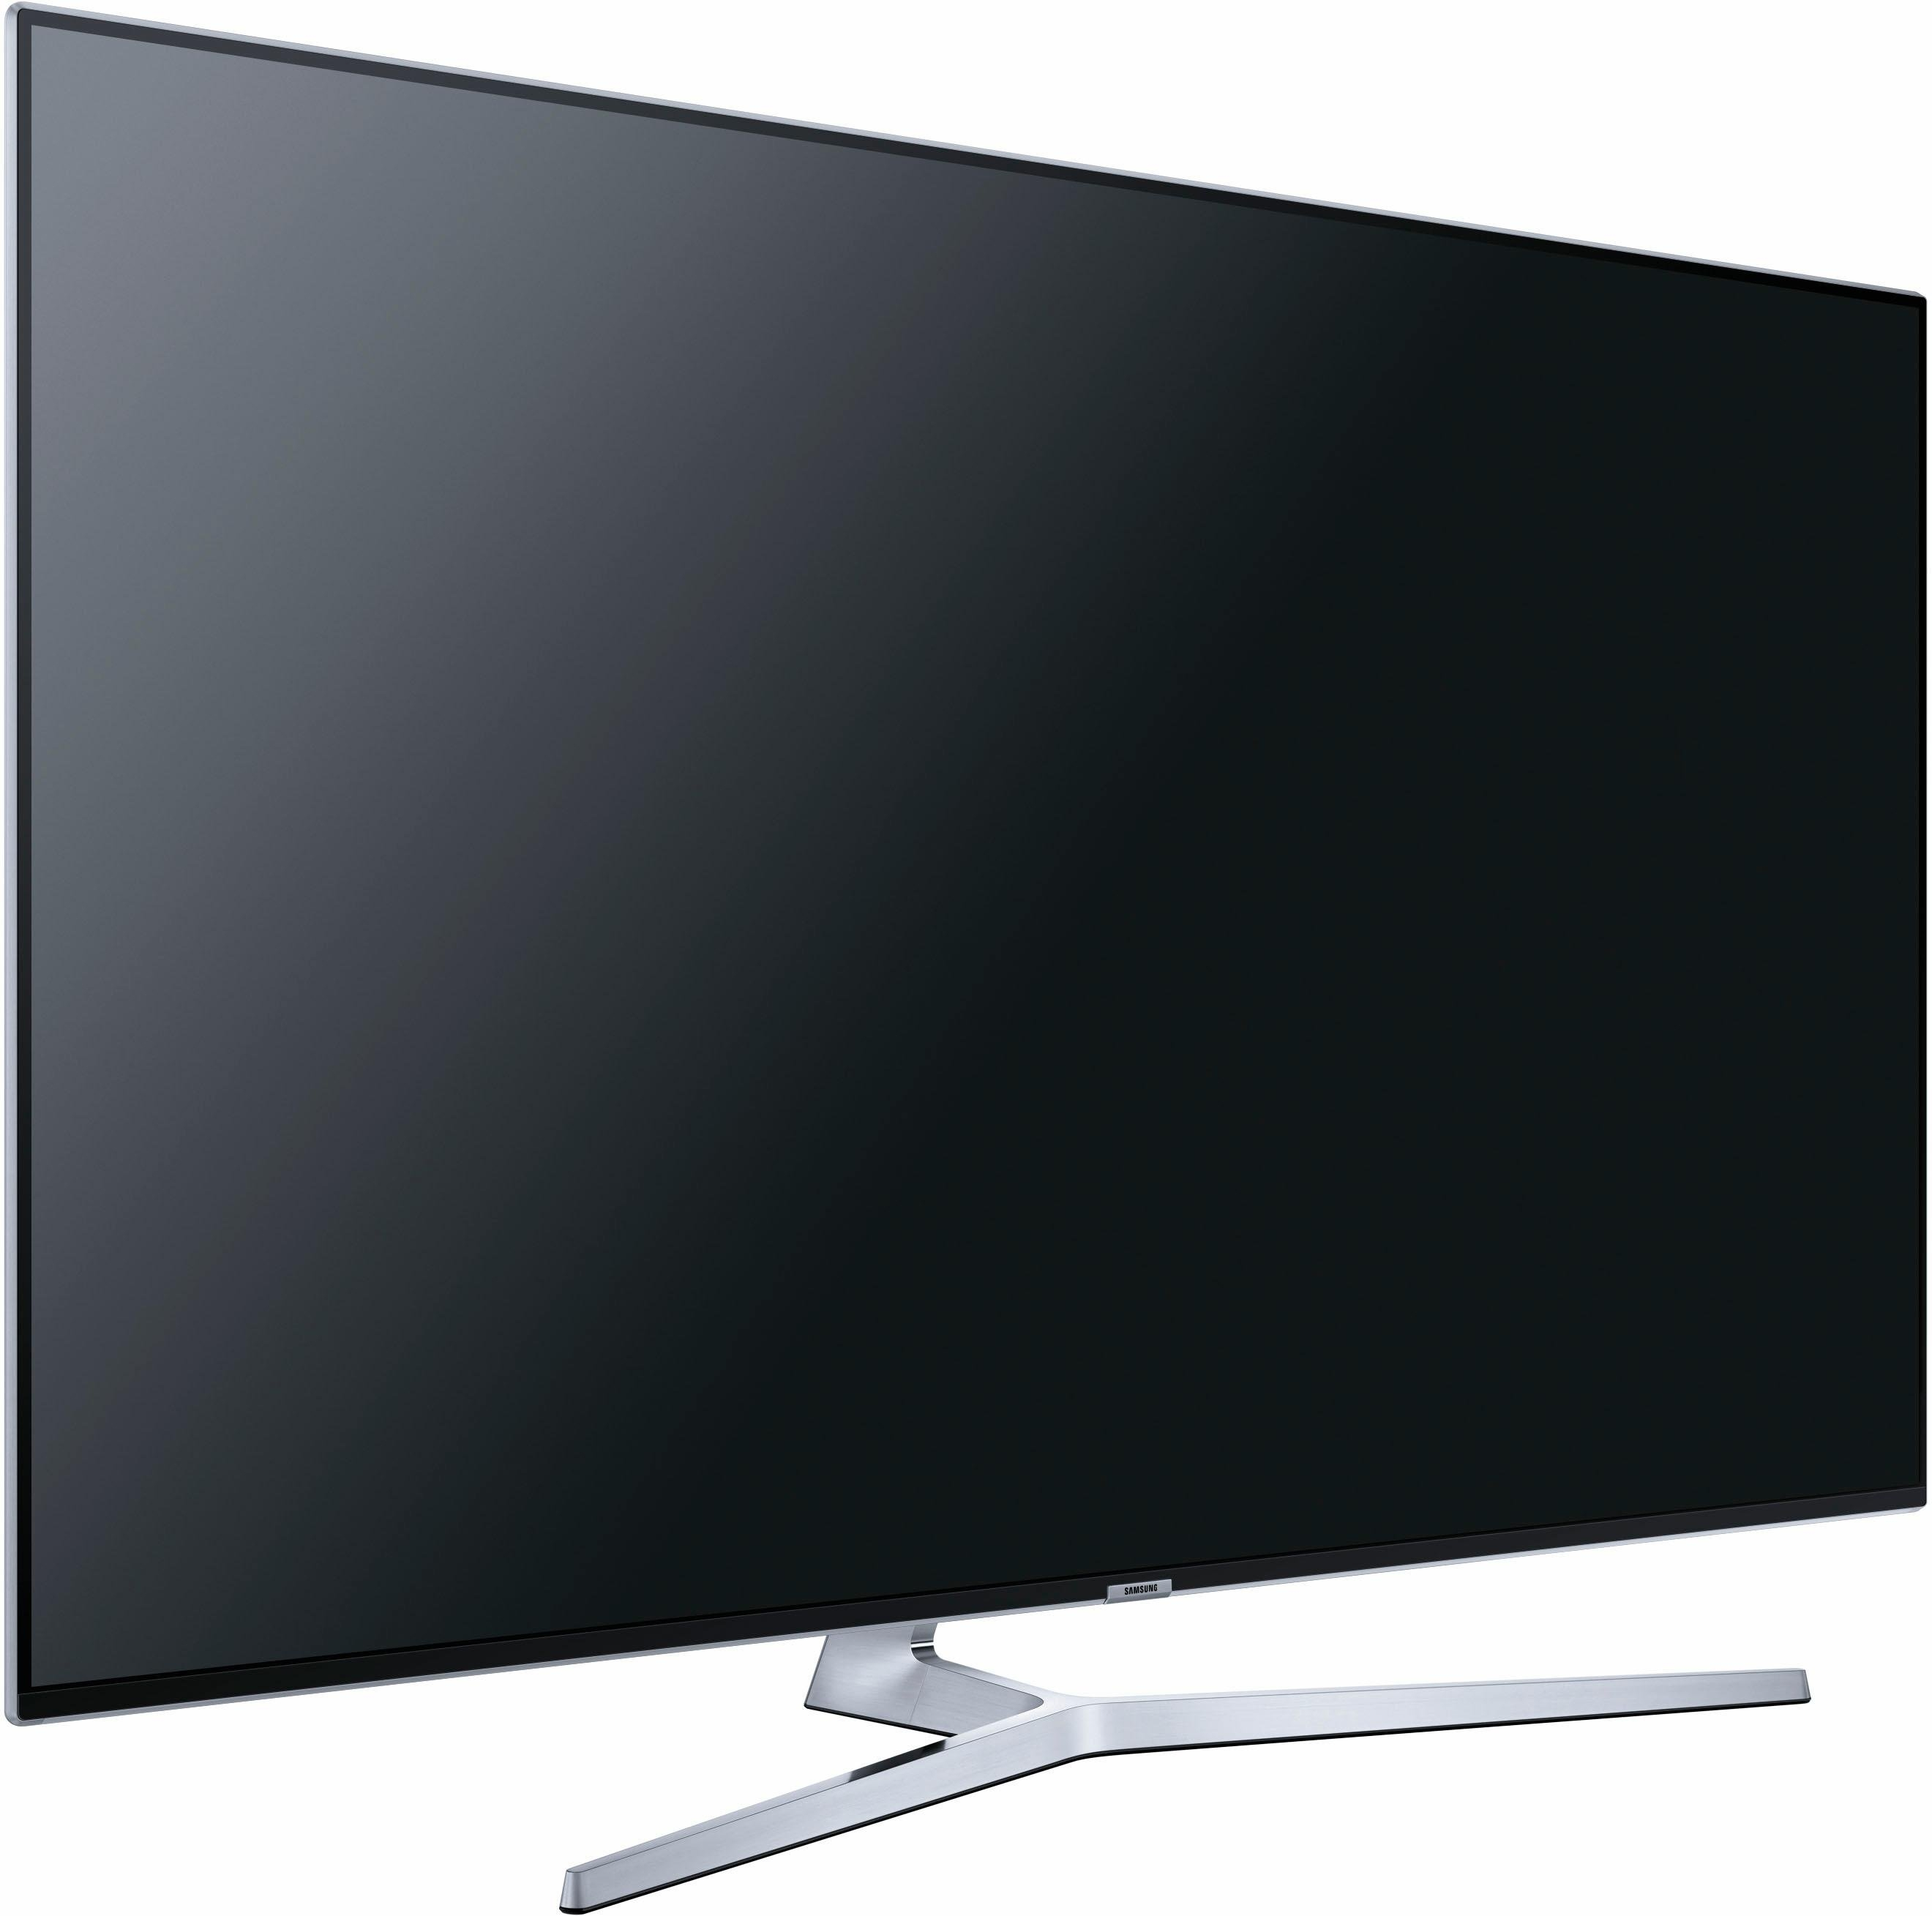 samsung ue55mu8009txzg led tv 138 cm 55 inch uhd 4k. Black Bedroom Furniture Sets. Home Design Ideas